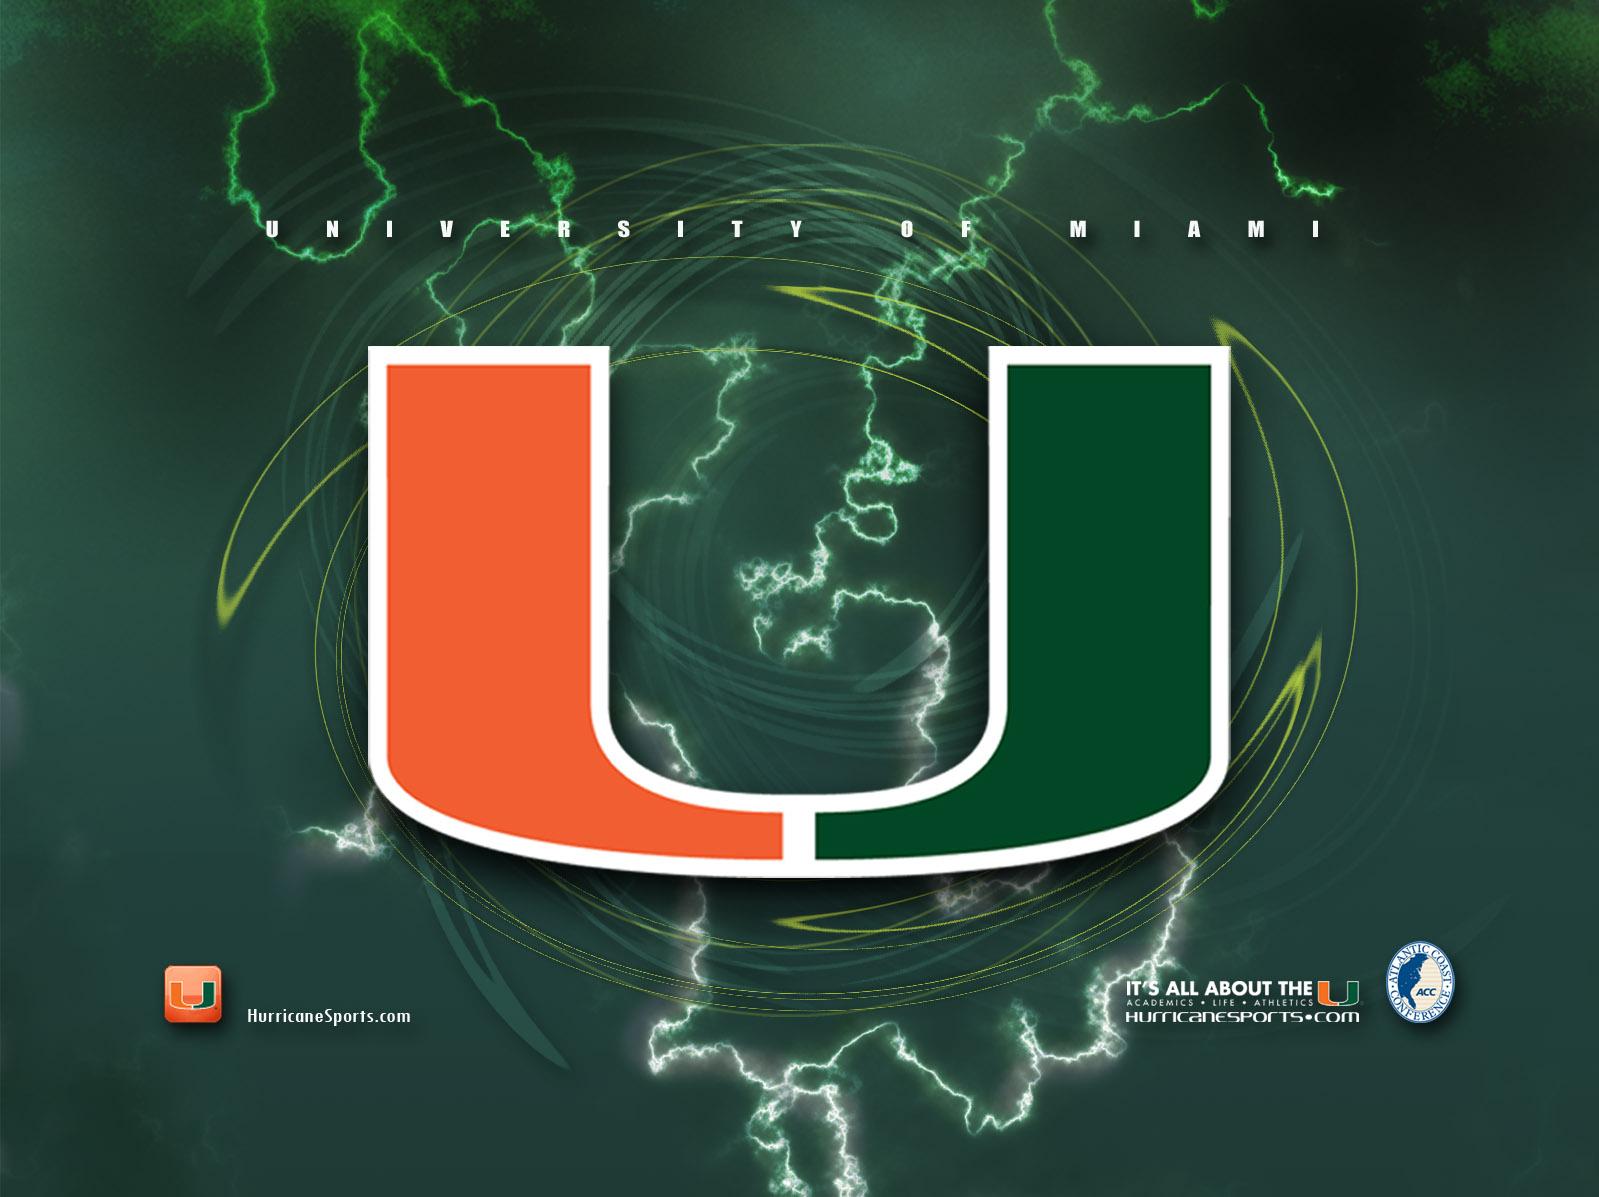 Hd Wallpapers Miami Hurricanes Football Screensaver Desktop 600 X 450 1599x1197